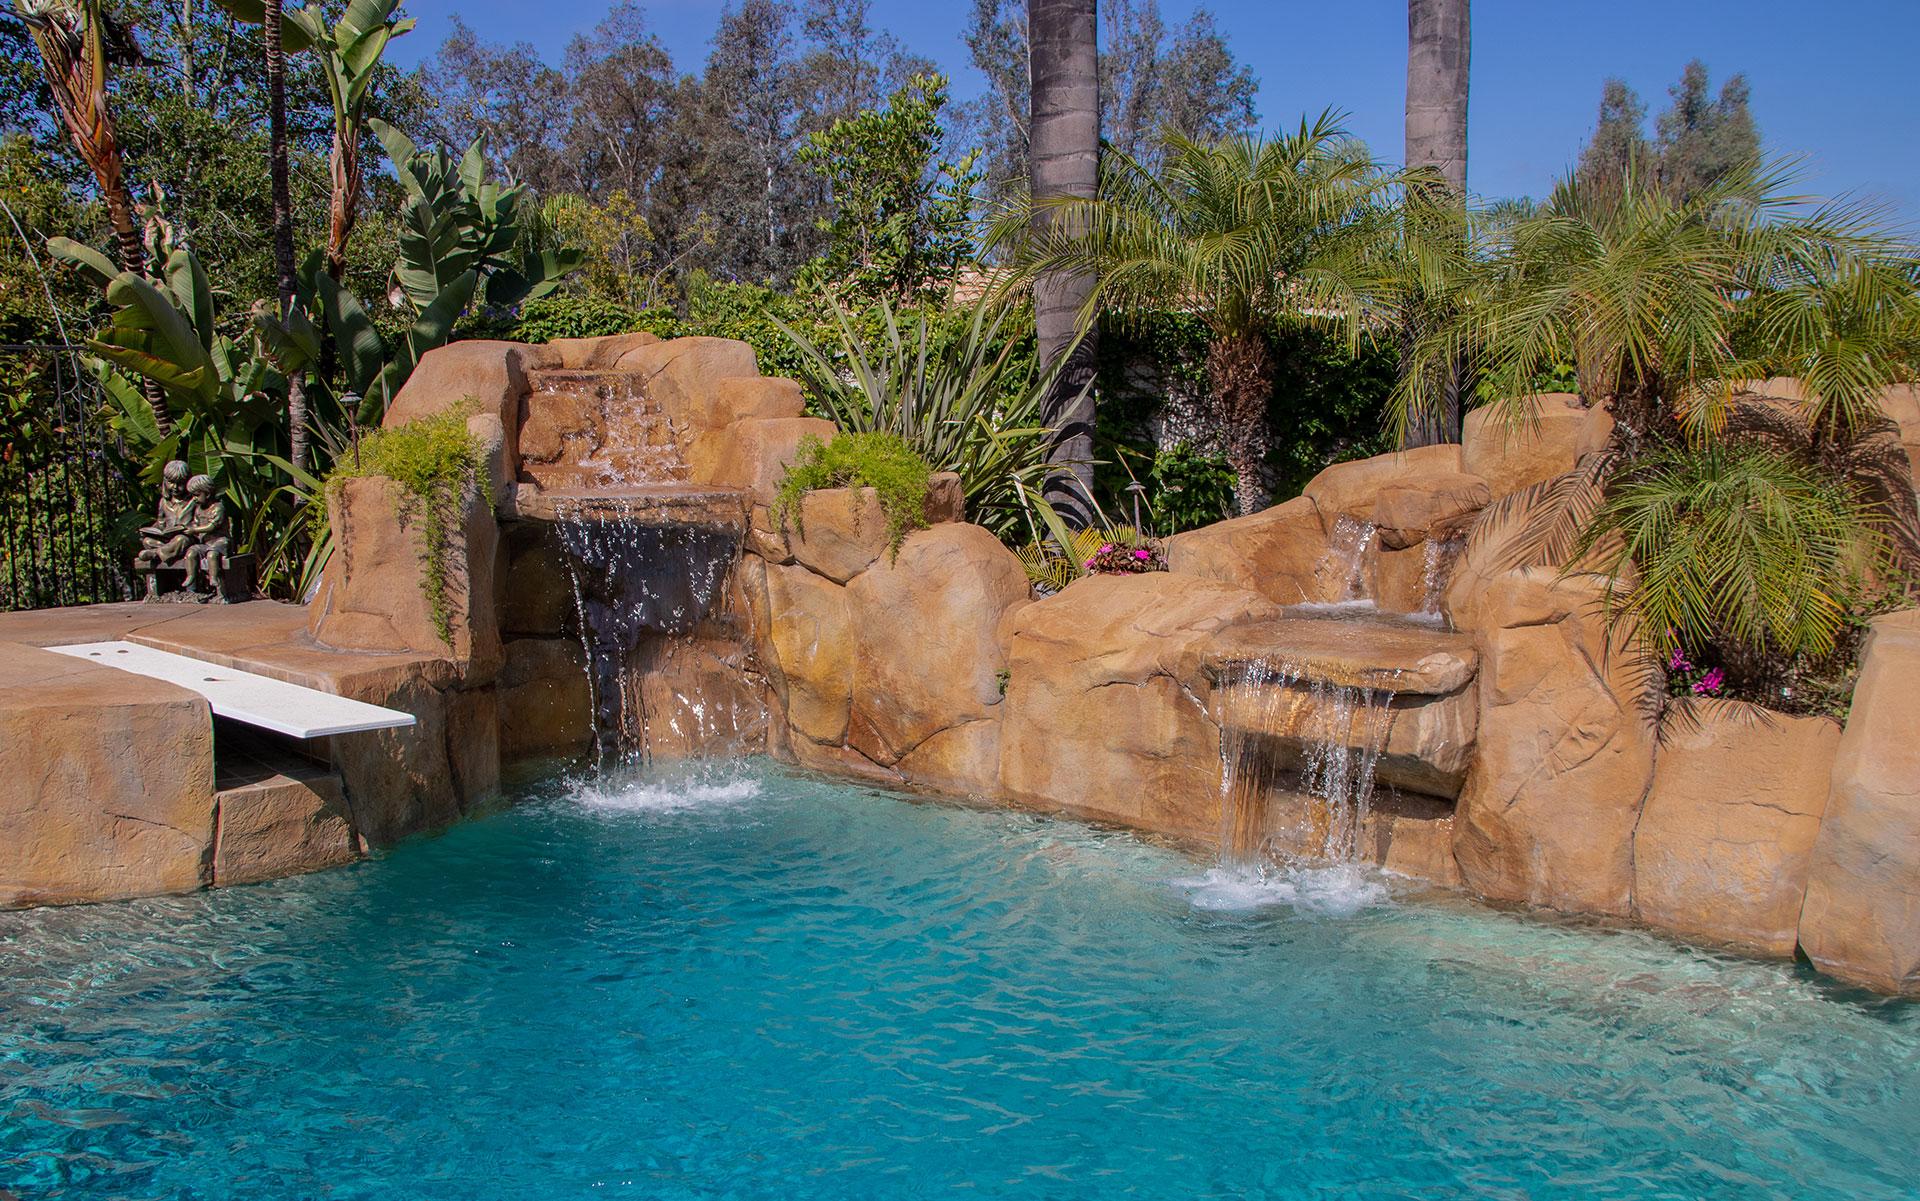 Ferris Texas swimming pool renovation